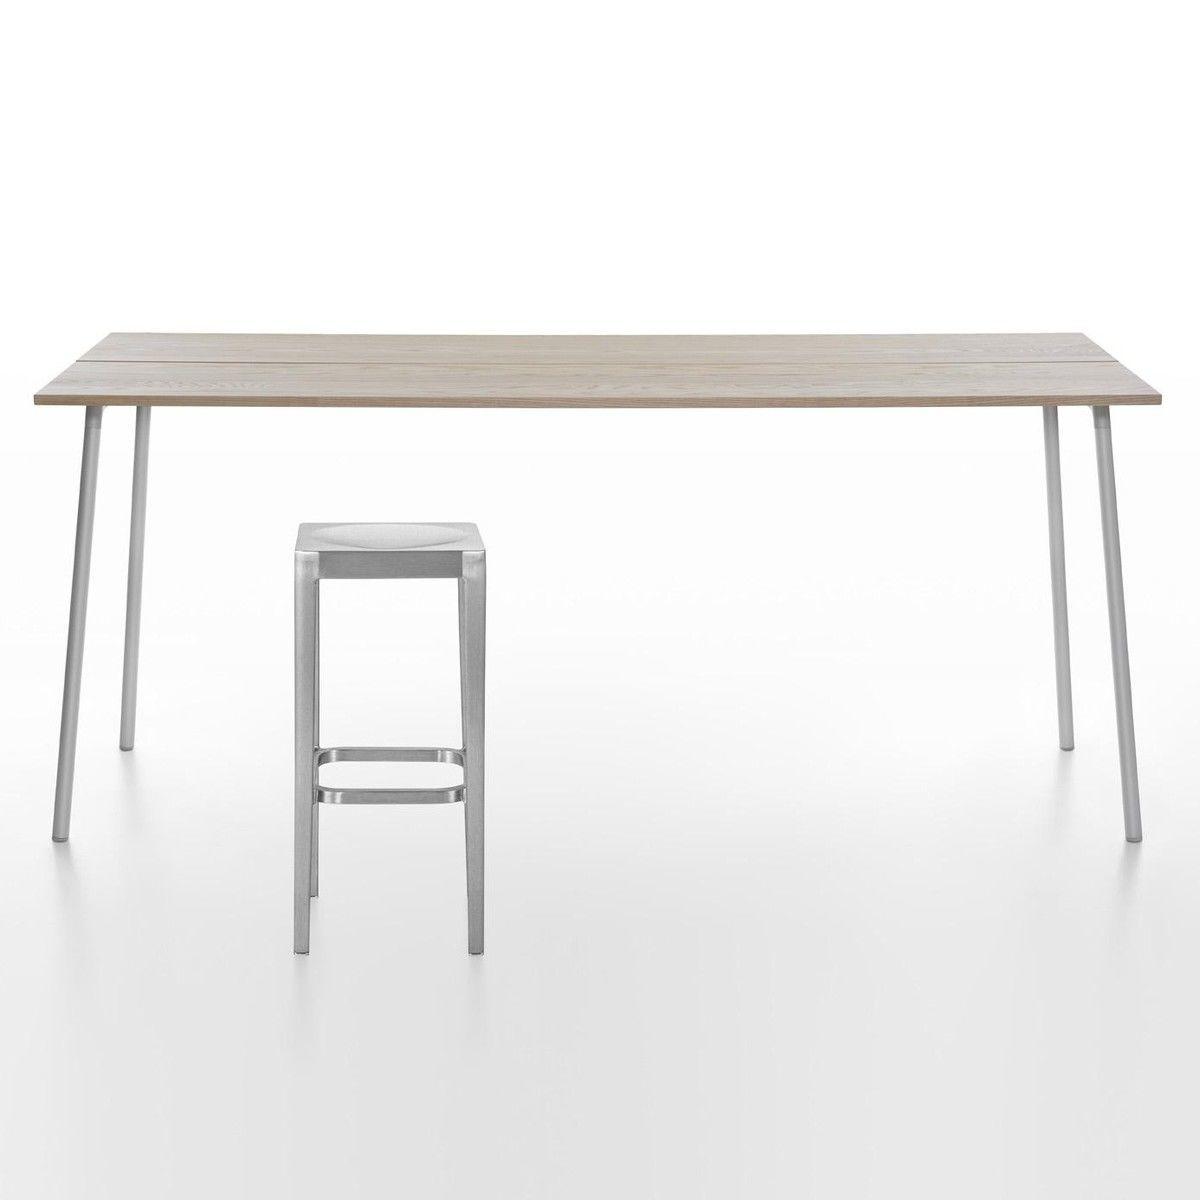 emeco stool tabouret empilable emeco. Black Bedroom Furniture Sets. Home Design Ideas